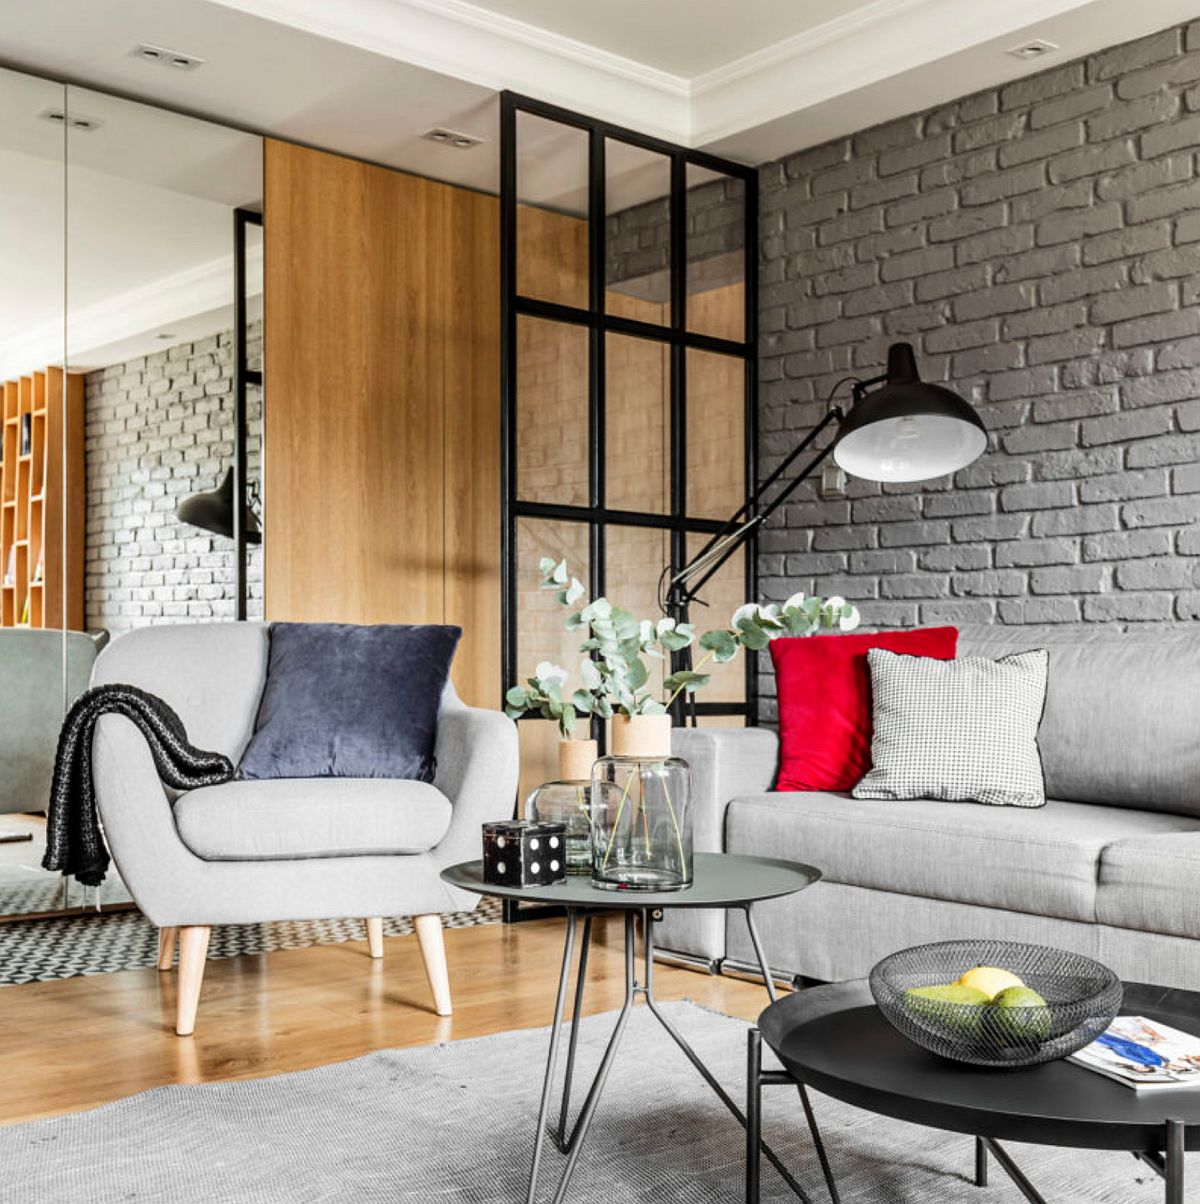 adelaparvu.com despre apartament 56 mp cu accente de rosu, design SAS Wnetrza i Kuchnie, Foto Strazynski Studio (5)